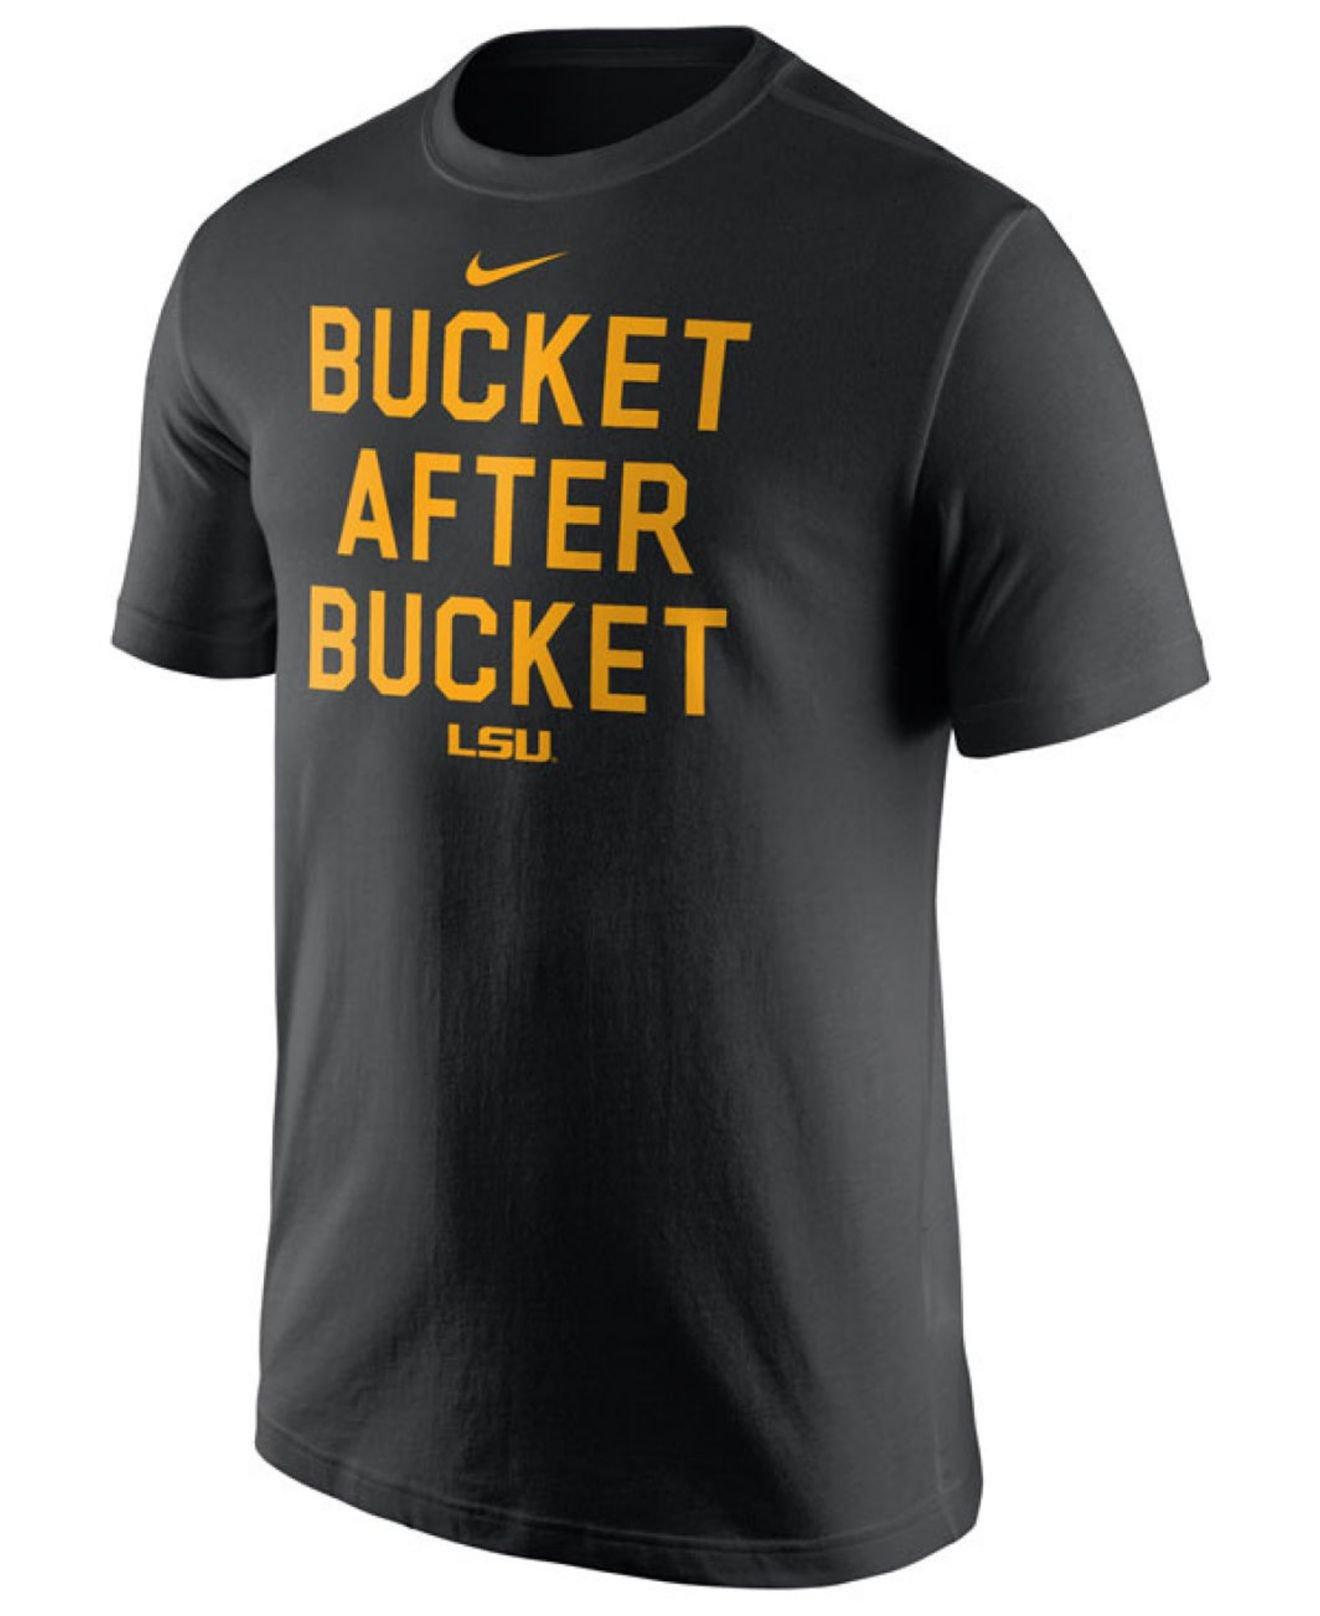 Ncaa Basketball T Shirts | All Basketball Scores Info